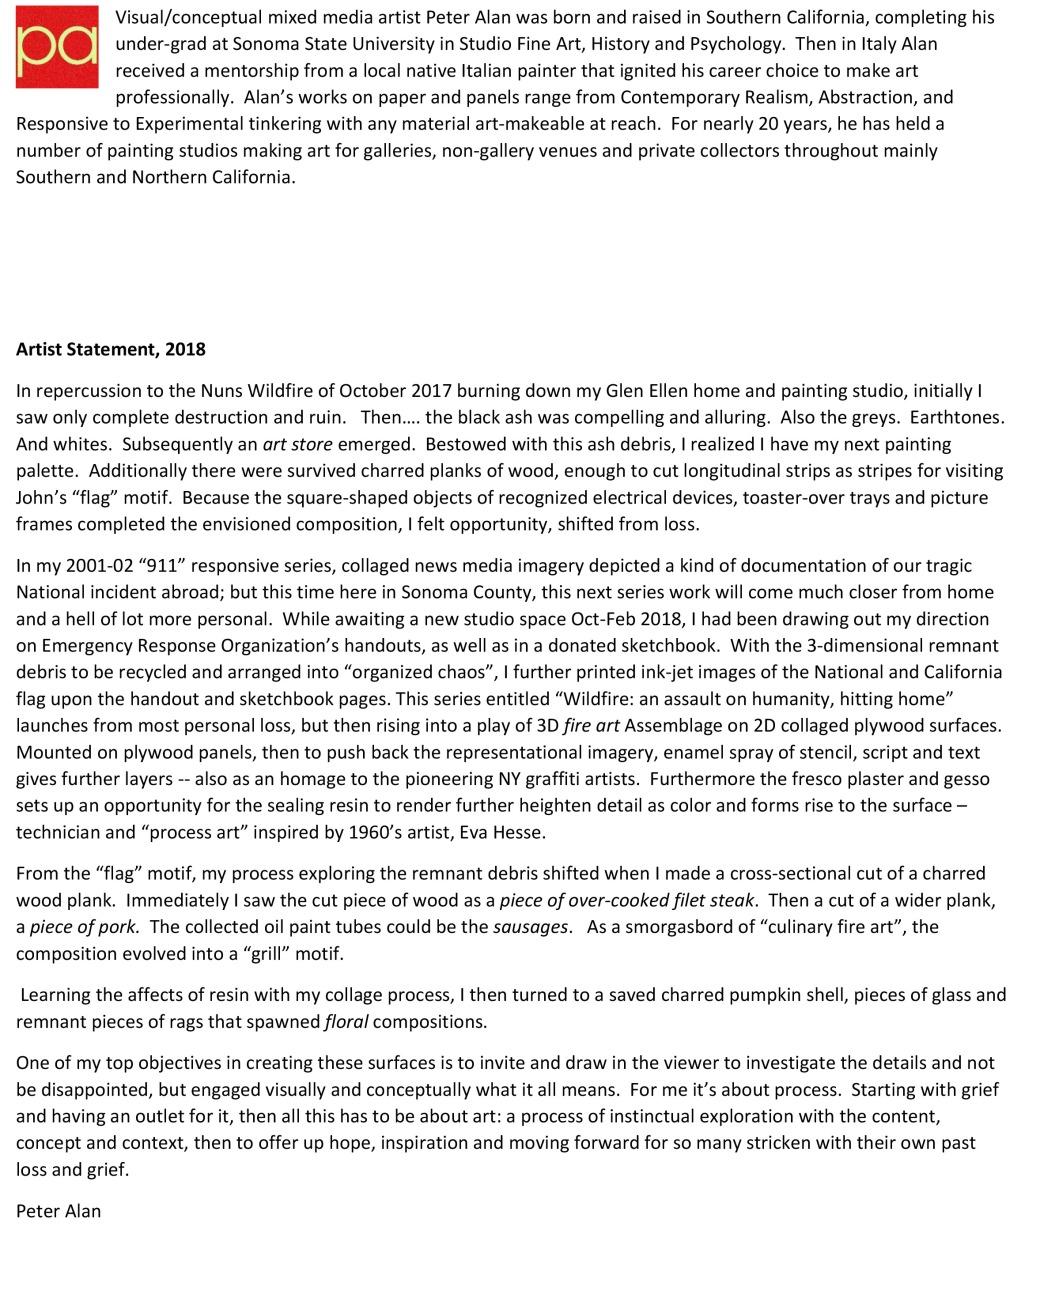 Microsoft Word - Alan_art_bio_state_wildfire18 (2)